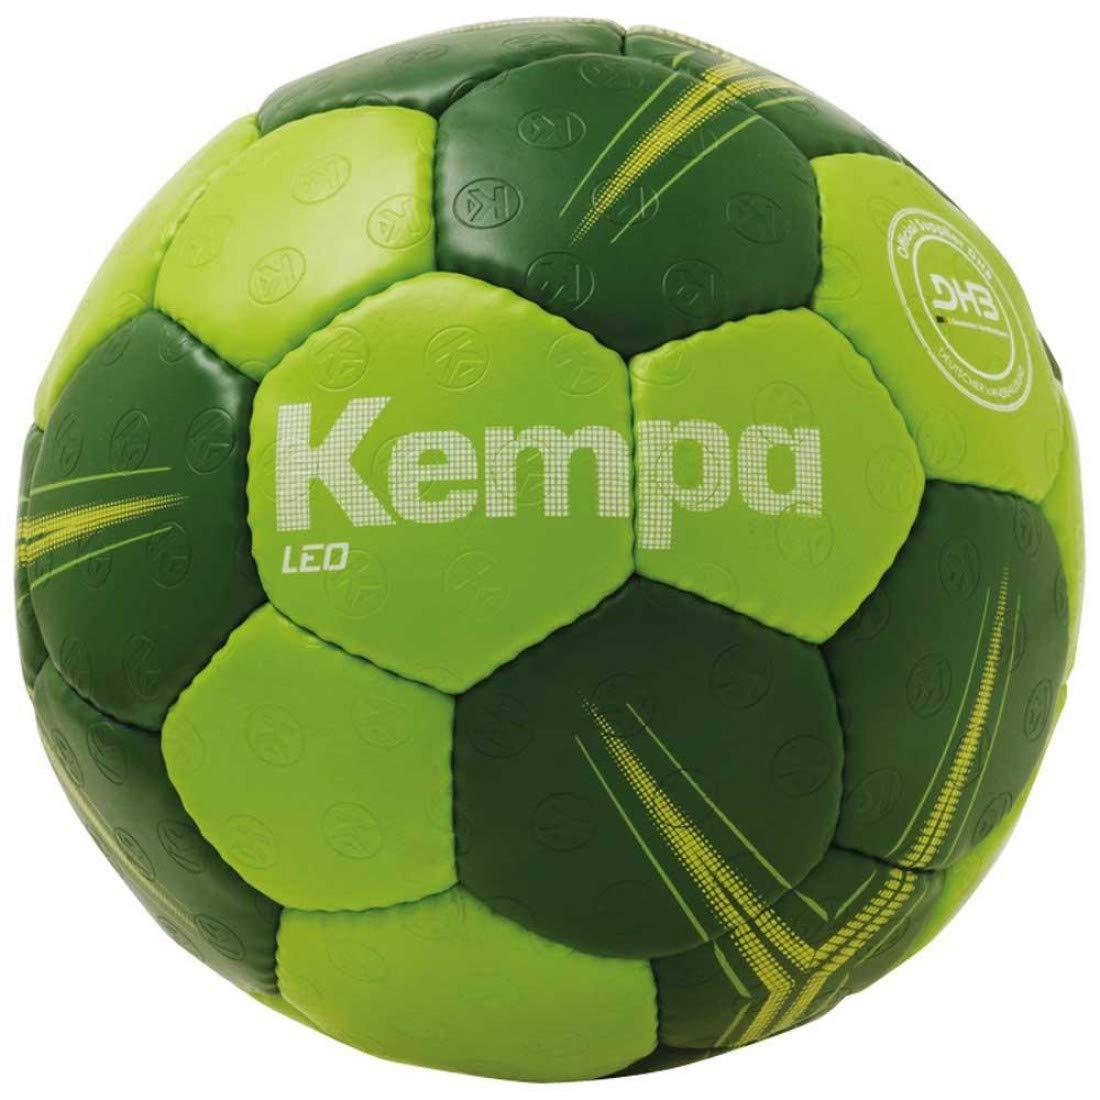 Kempa Pro-X Match Profile Pelota de Balonmano, Unisex Adulto, Azul ...